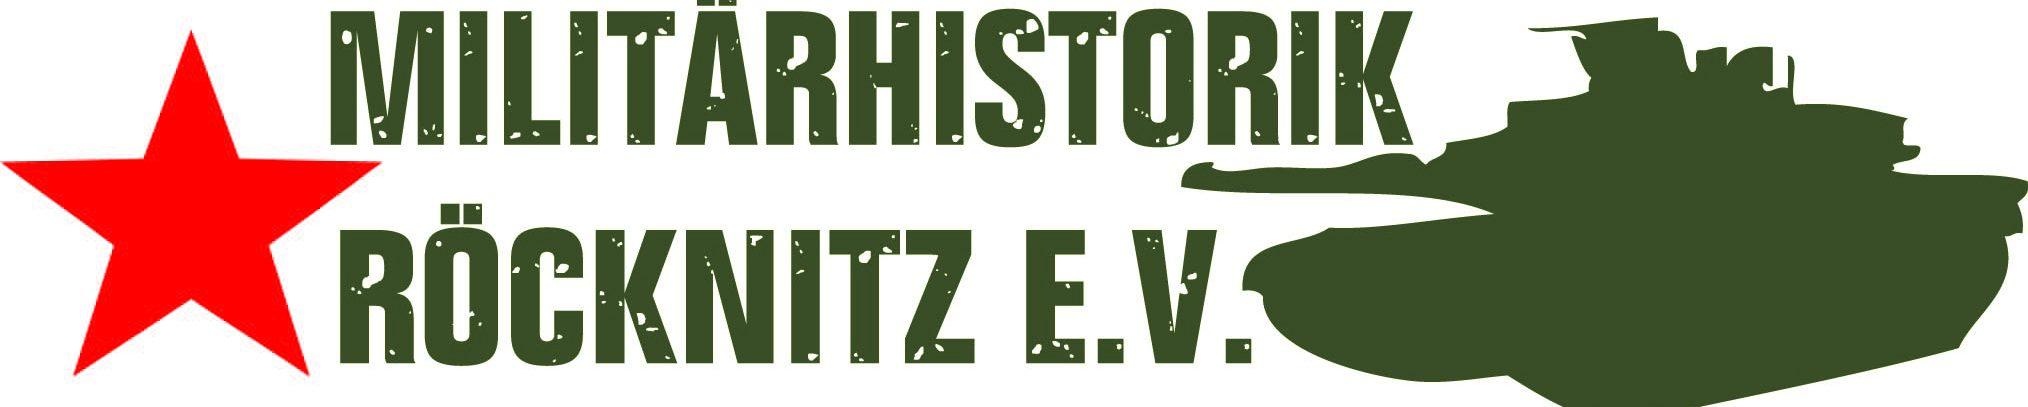 Militärhistorik Röcknitz e.V.